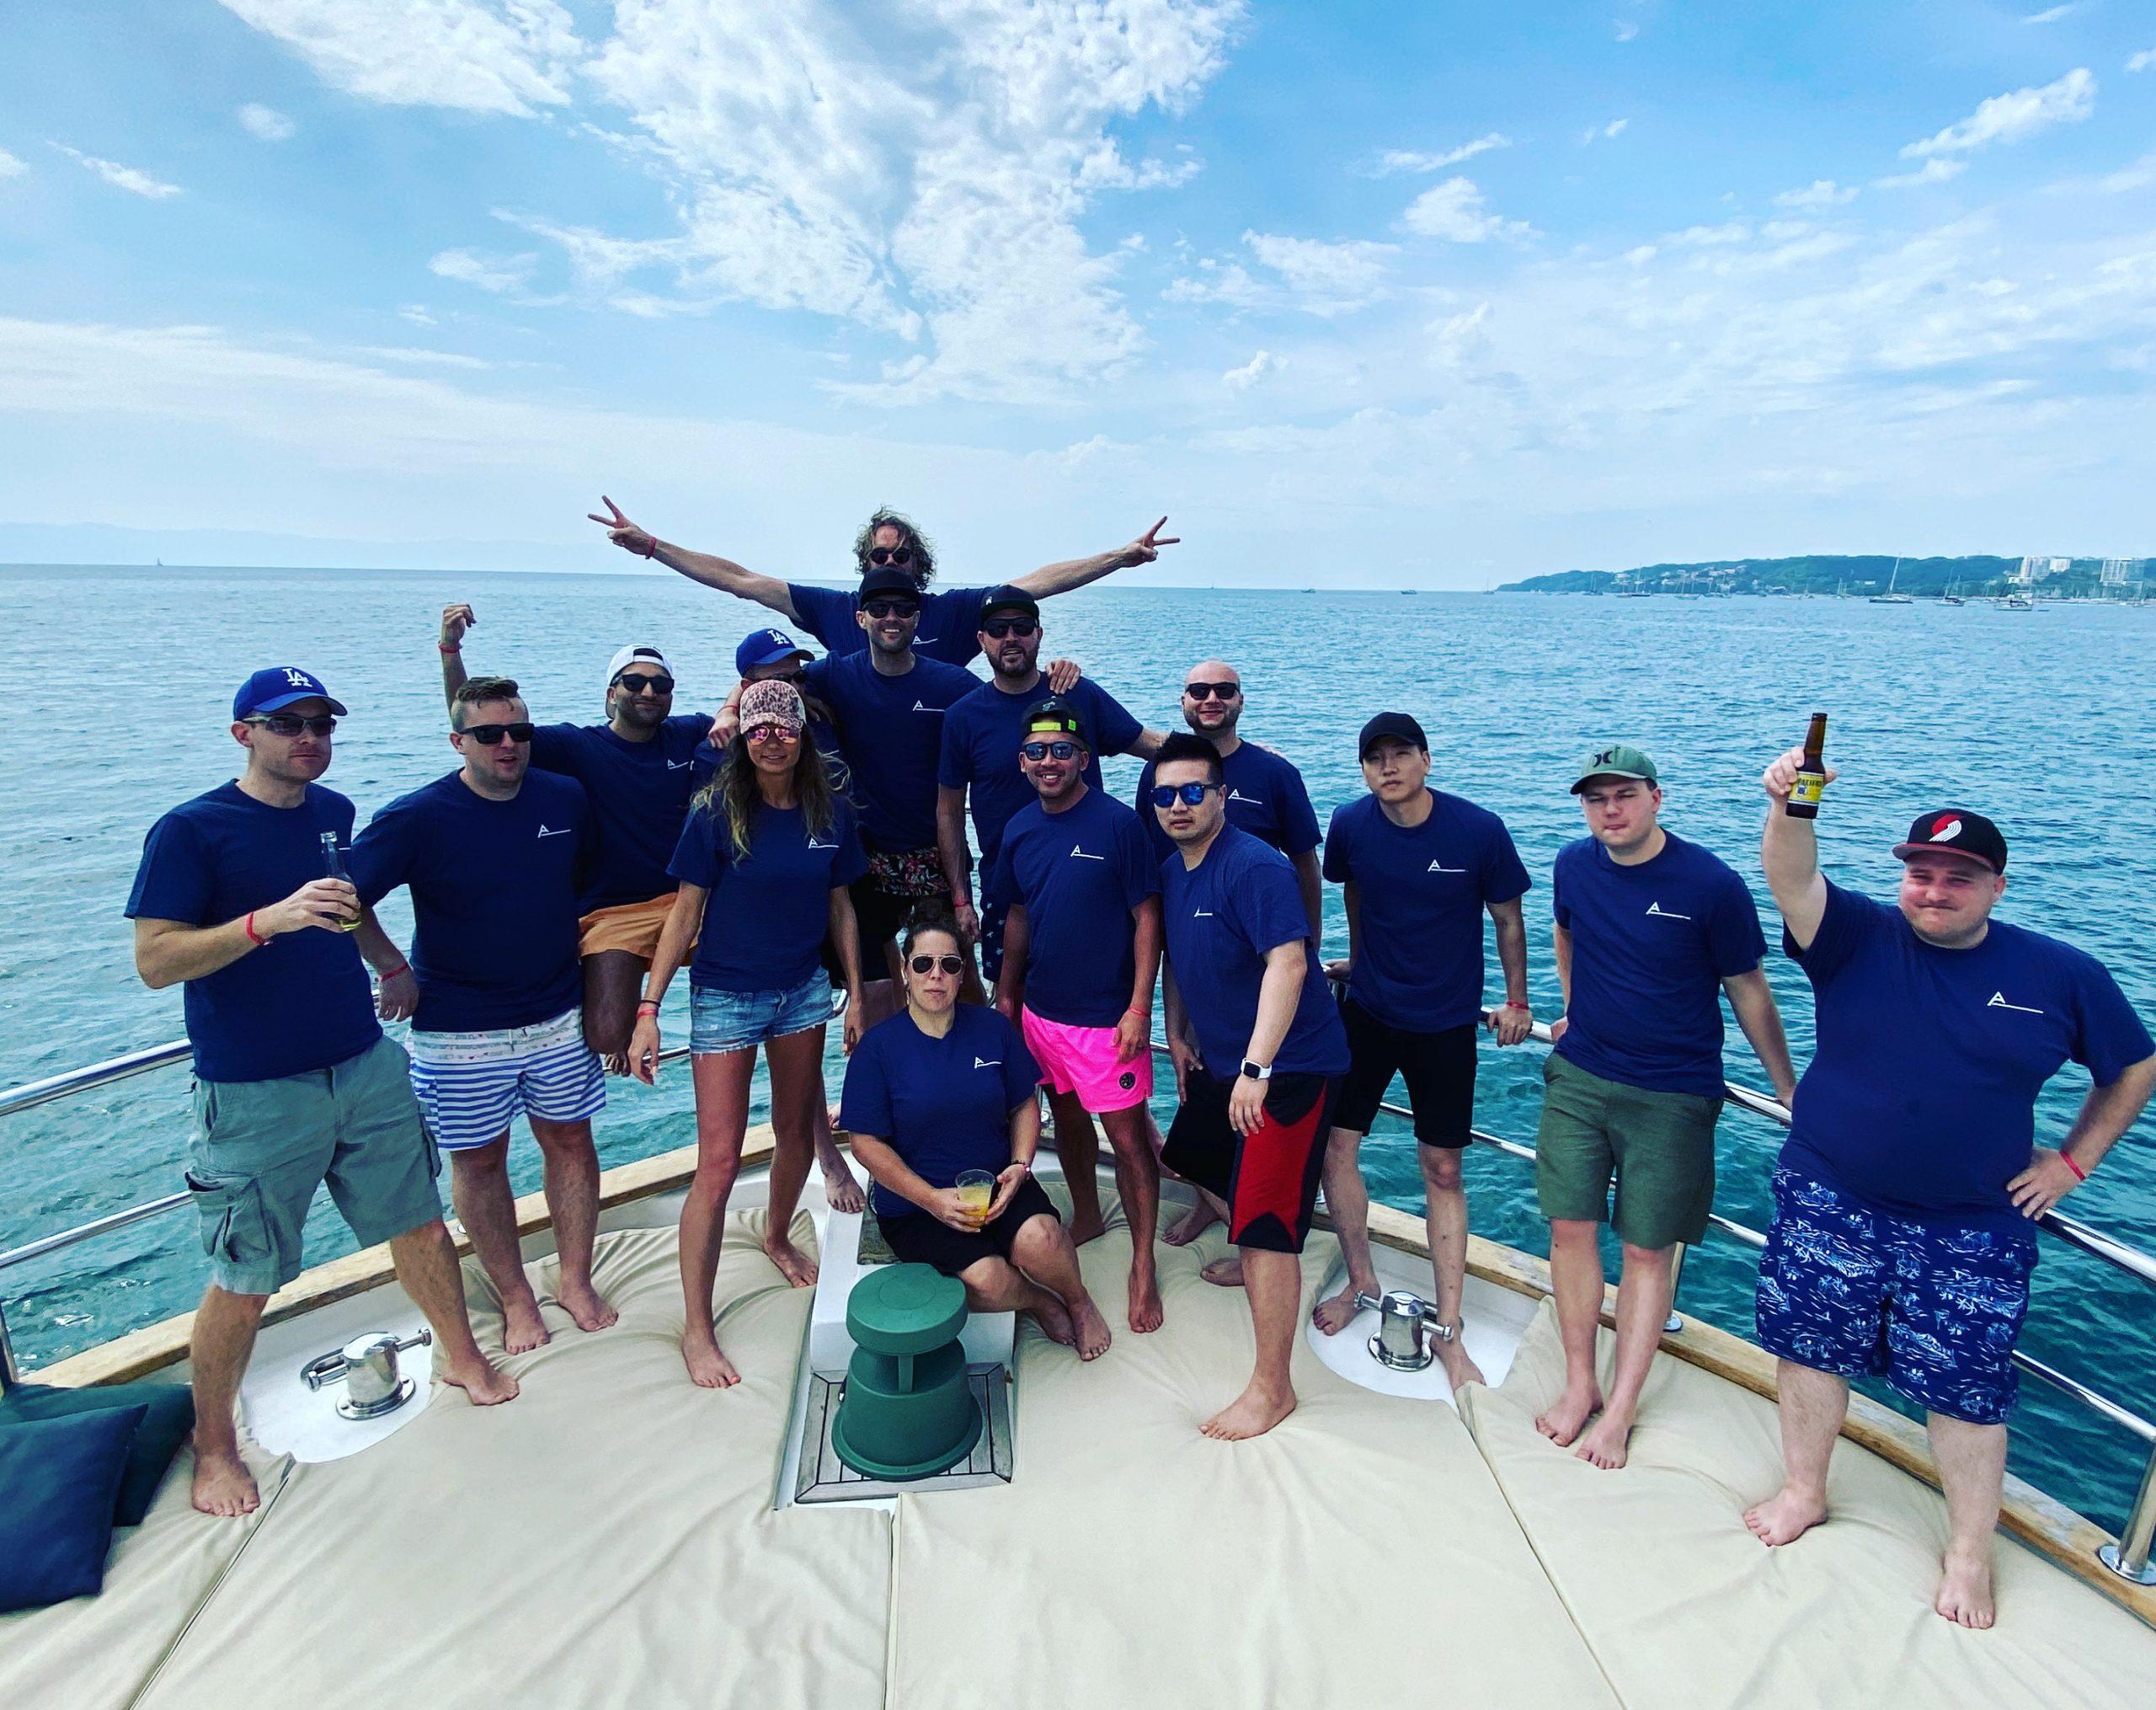 Apex Wireless Staff on a boat